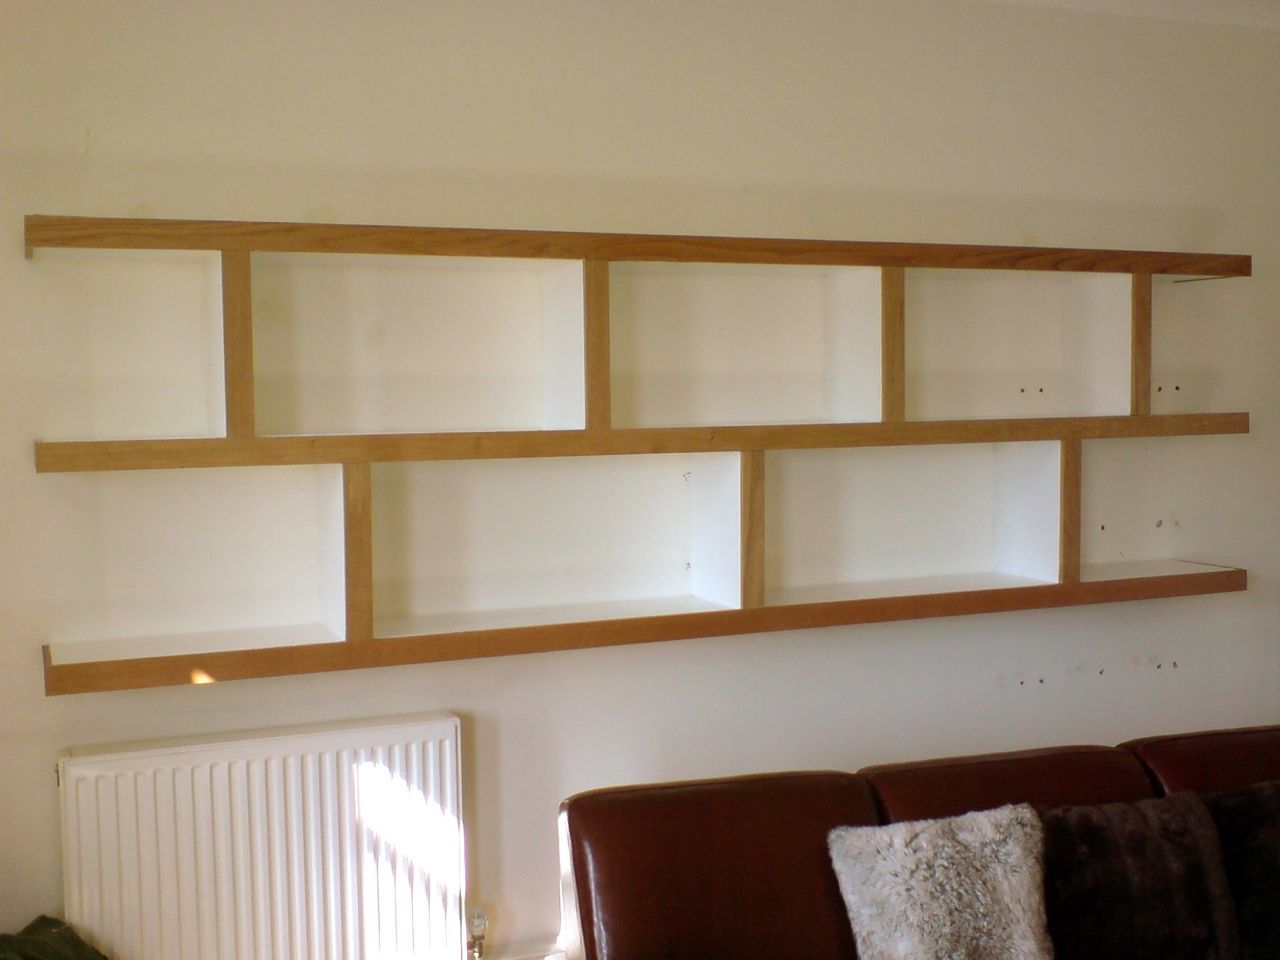 Amazing and smart wall shelving design ideas wall - Wall mounted shelving ideas ...